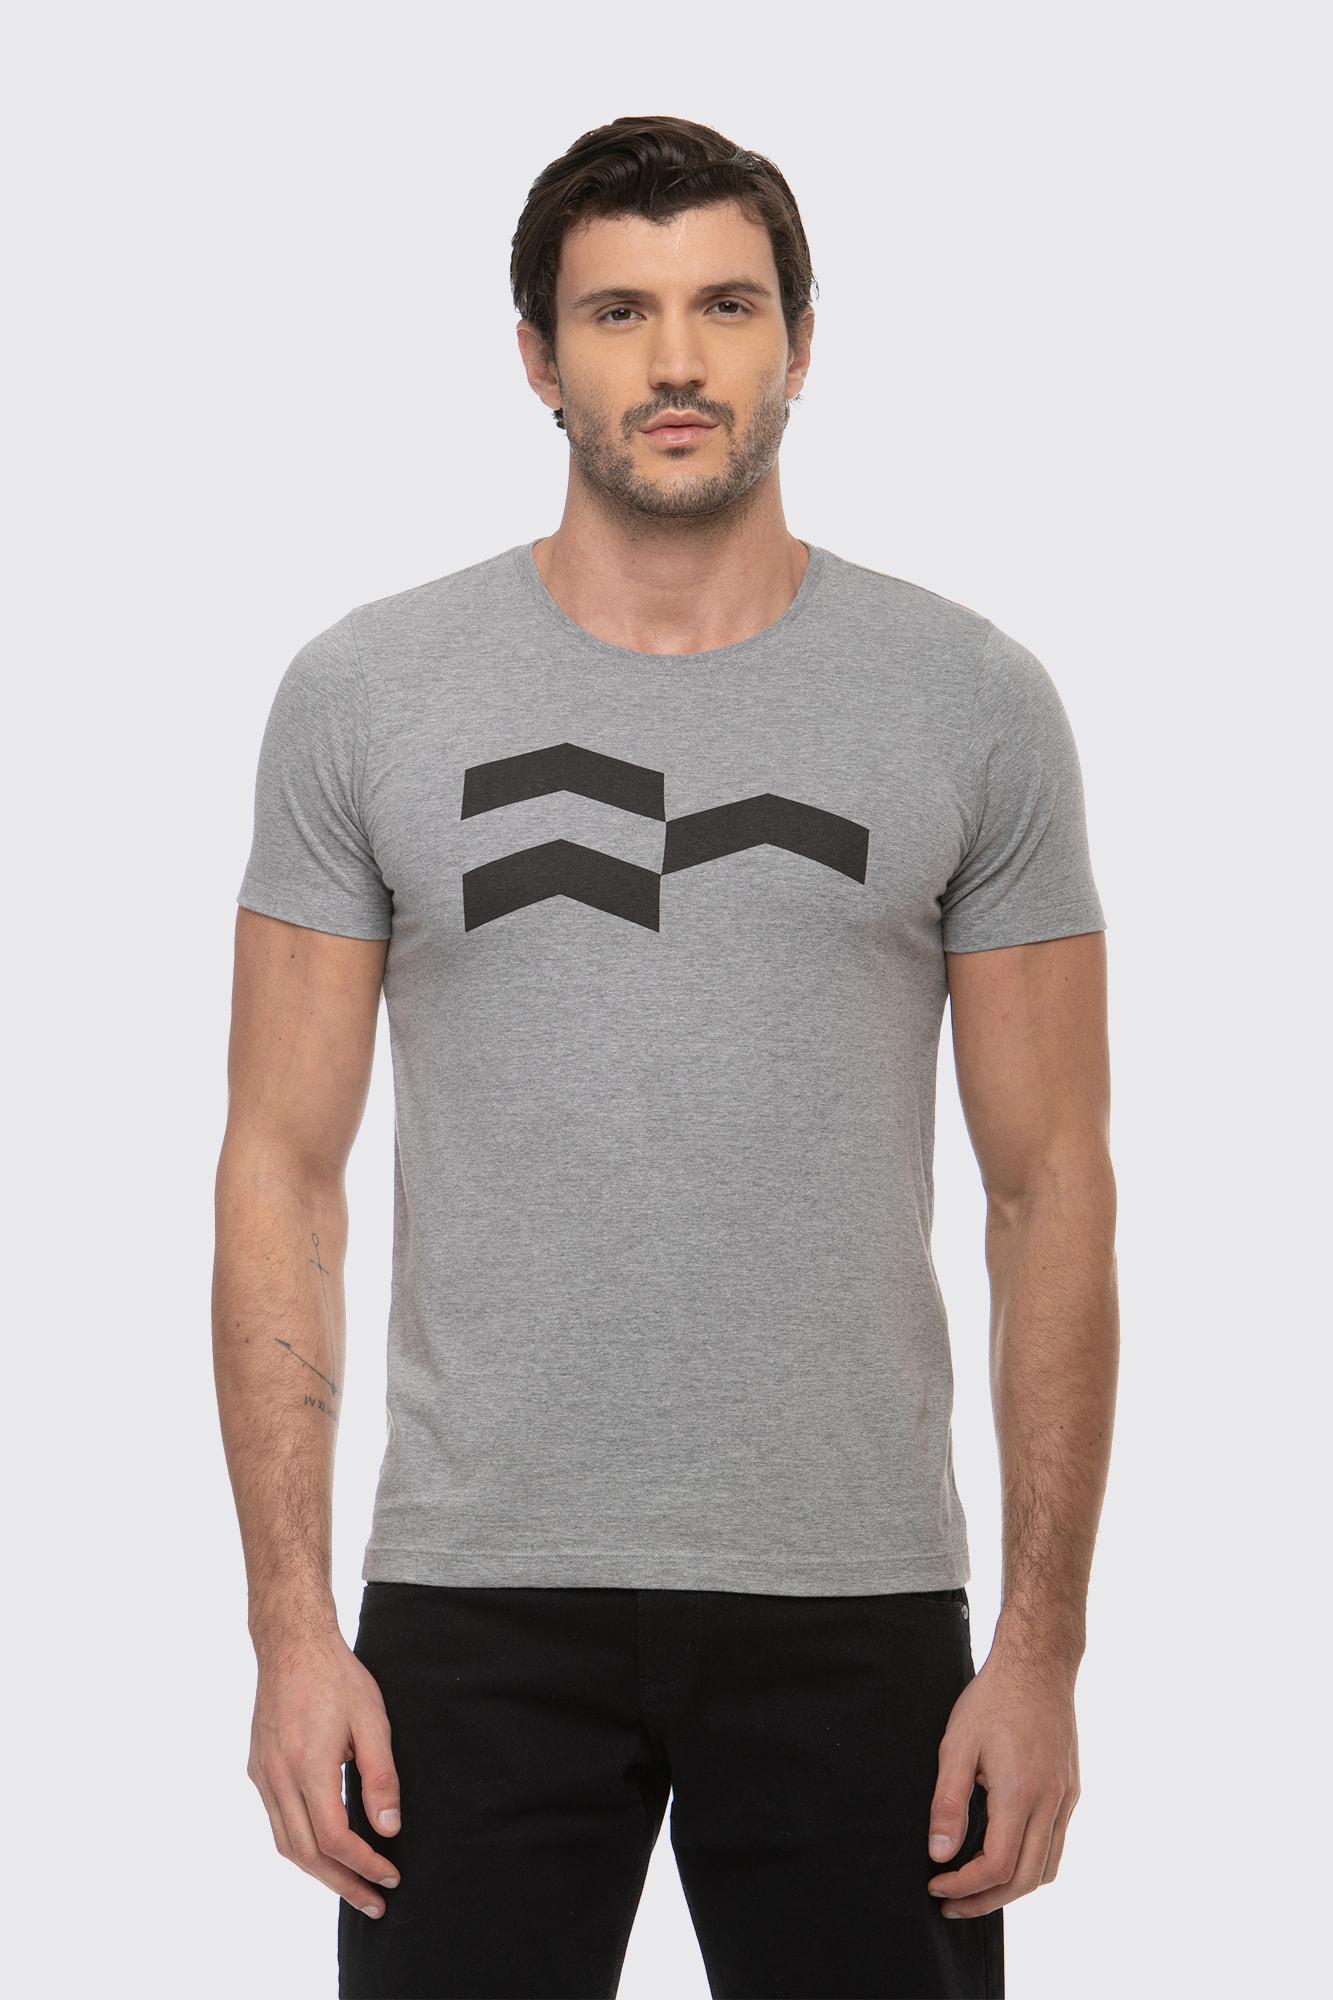 Camiseta Símbolo Gráfico Mescla